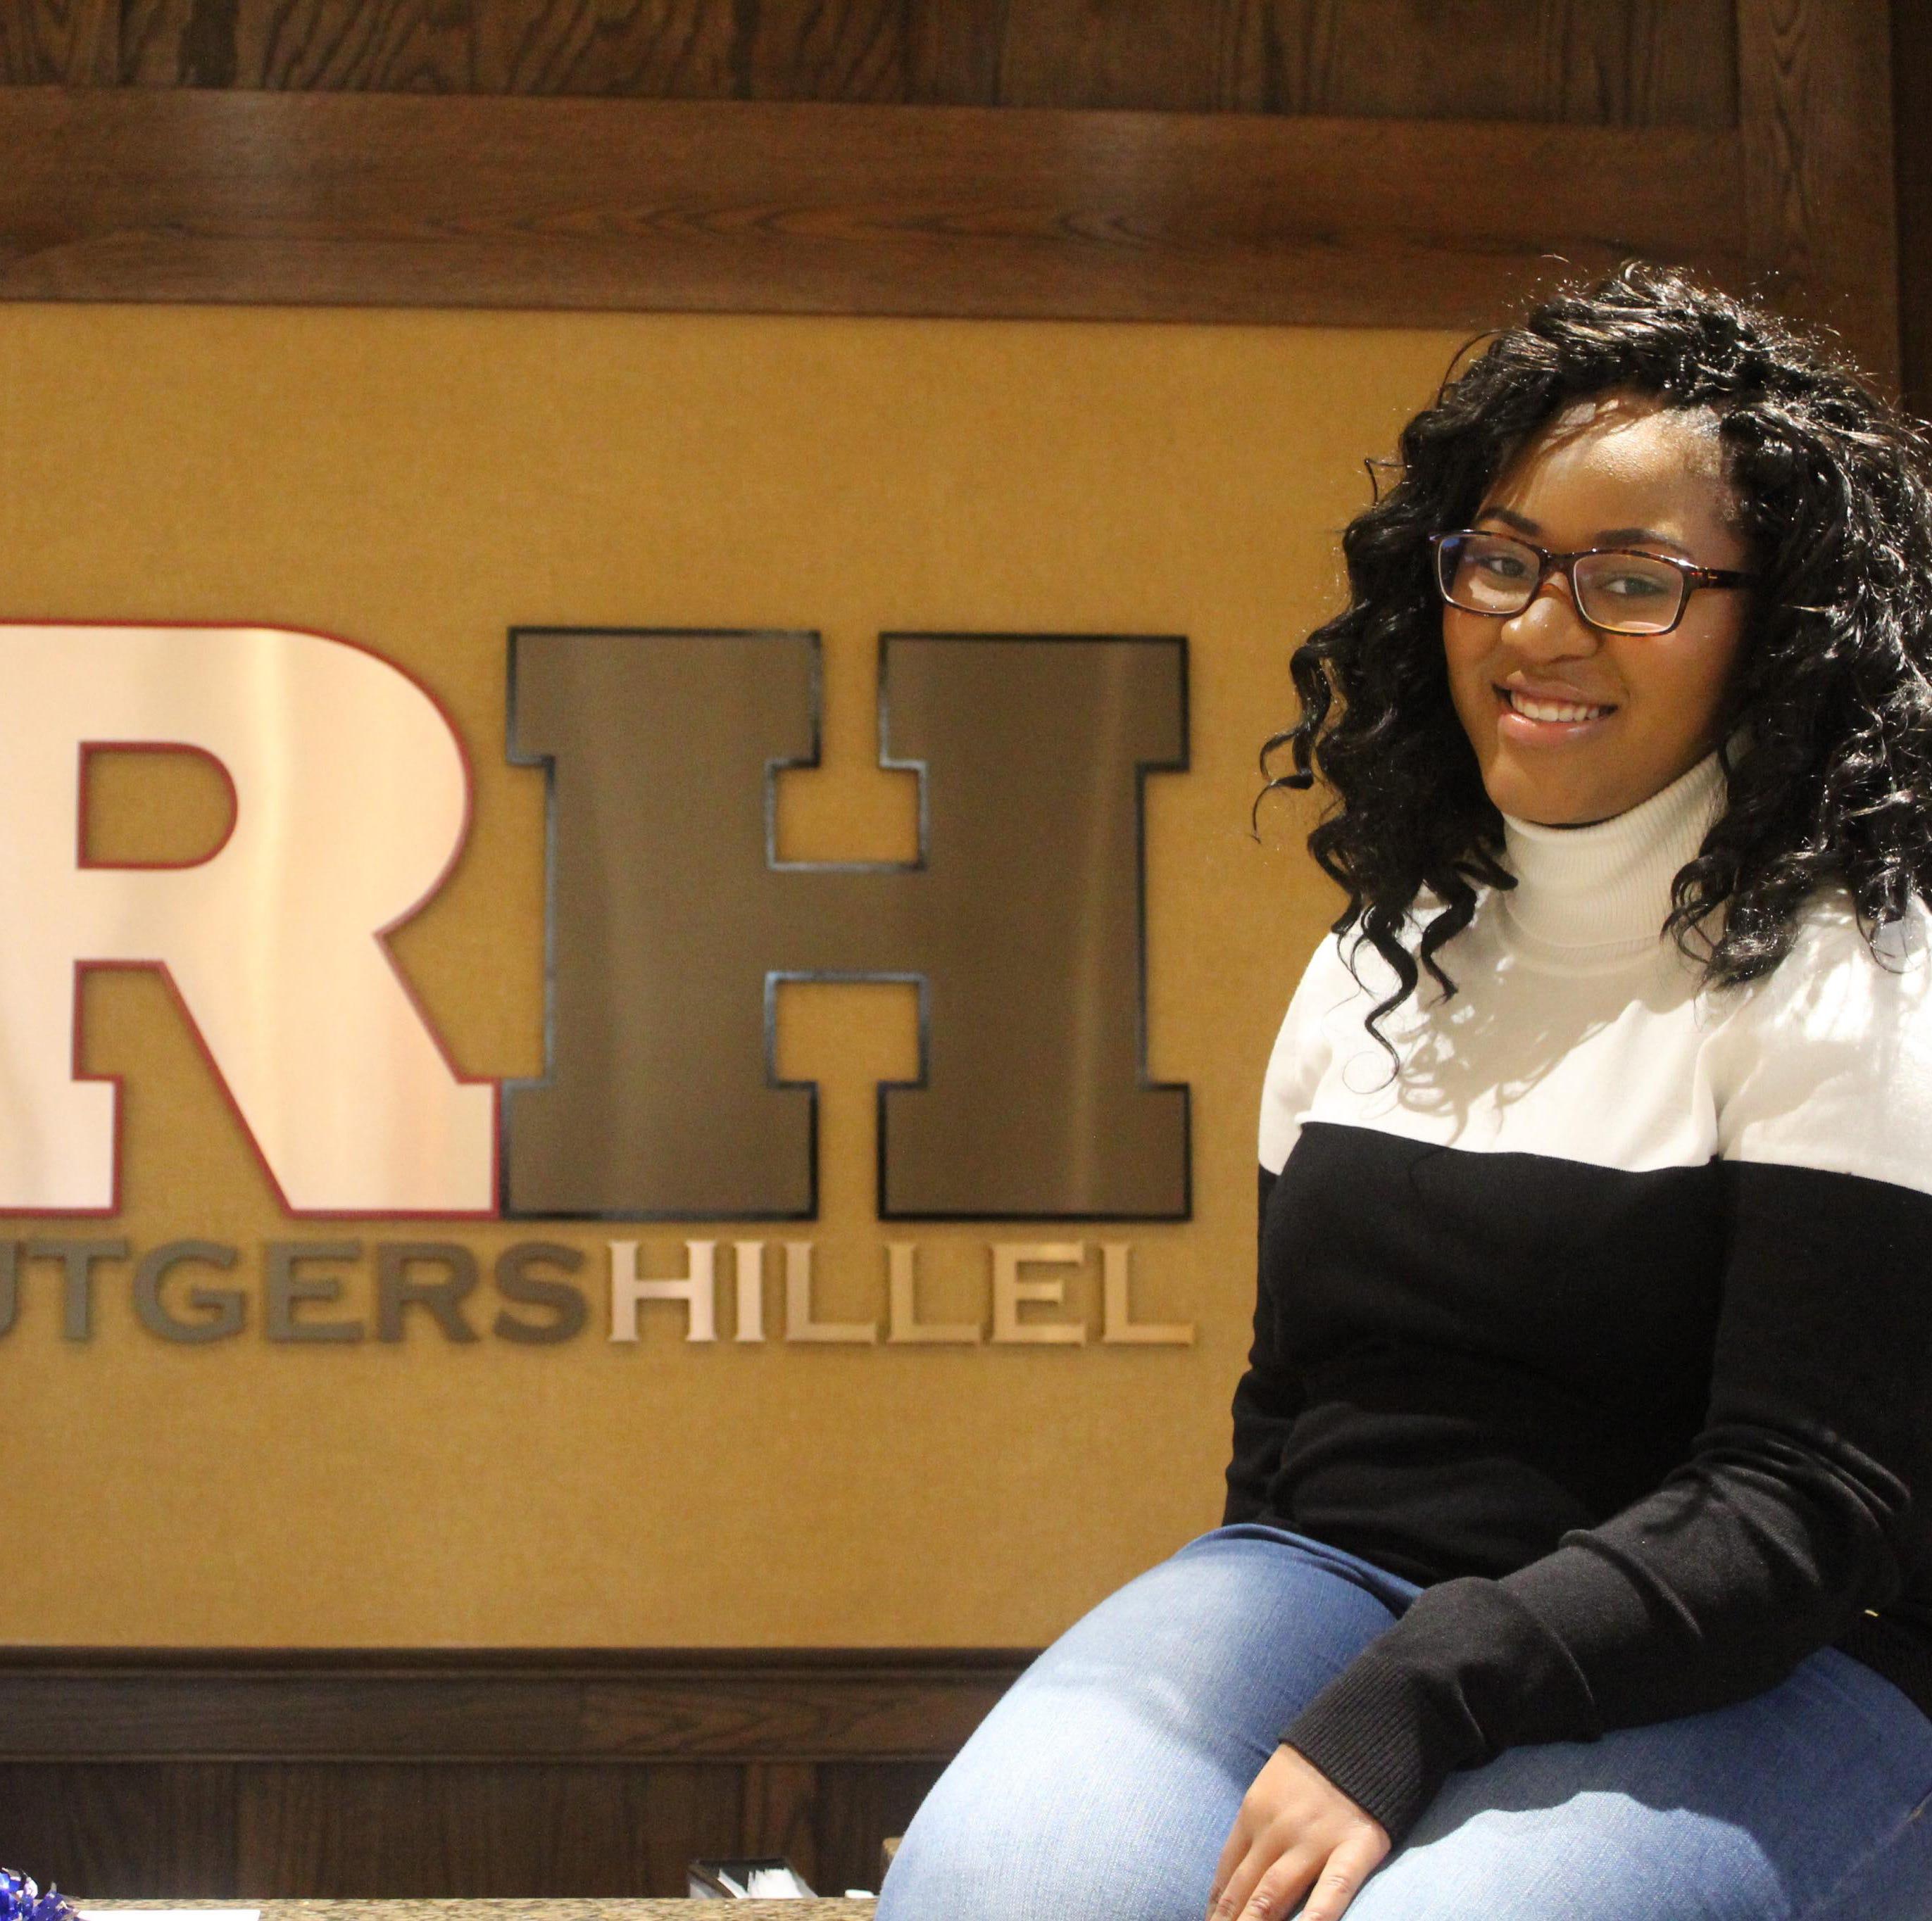 Black and Jewish, Fedline Saintina finds a home at Rutgers Hillel